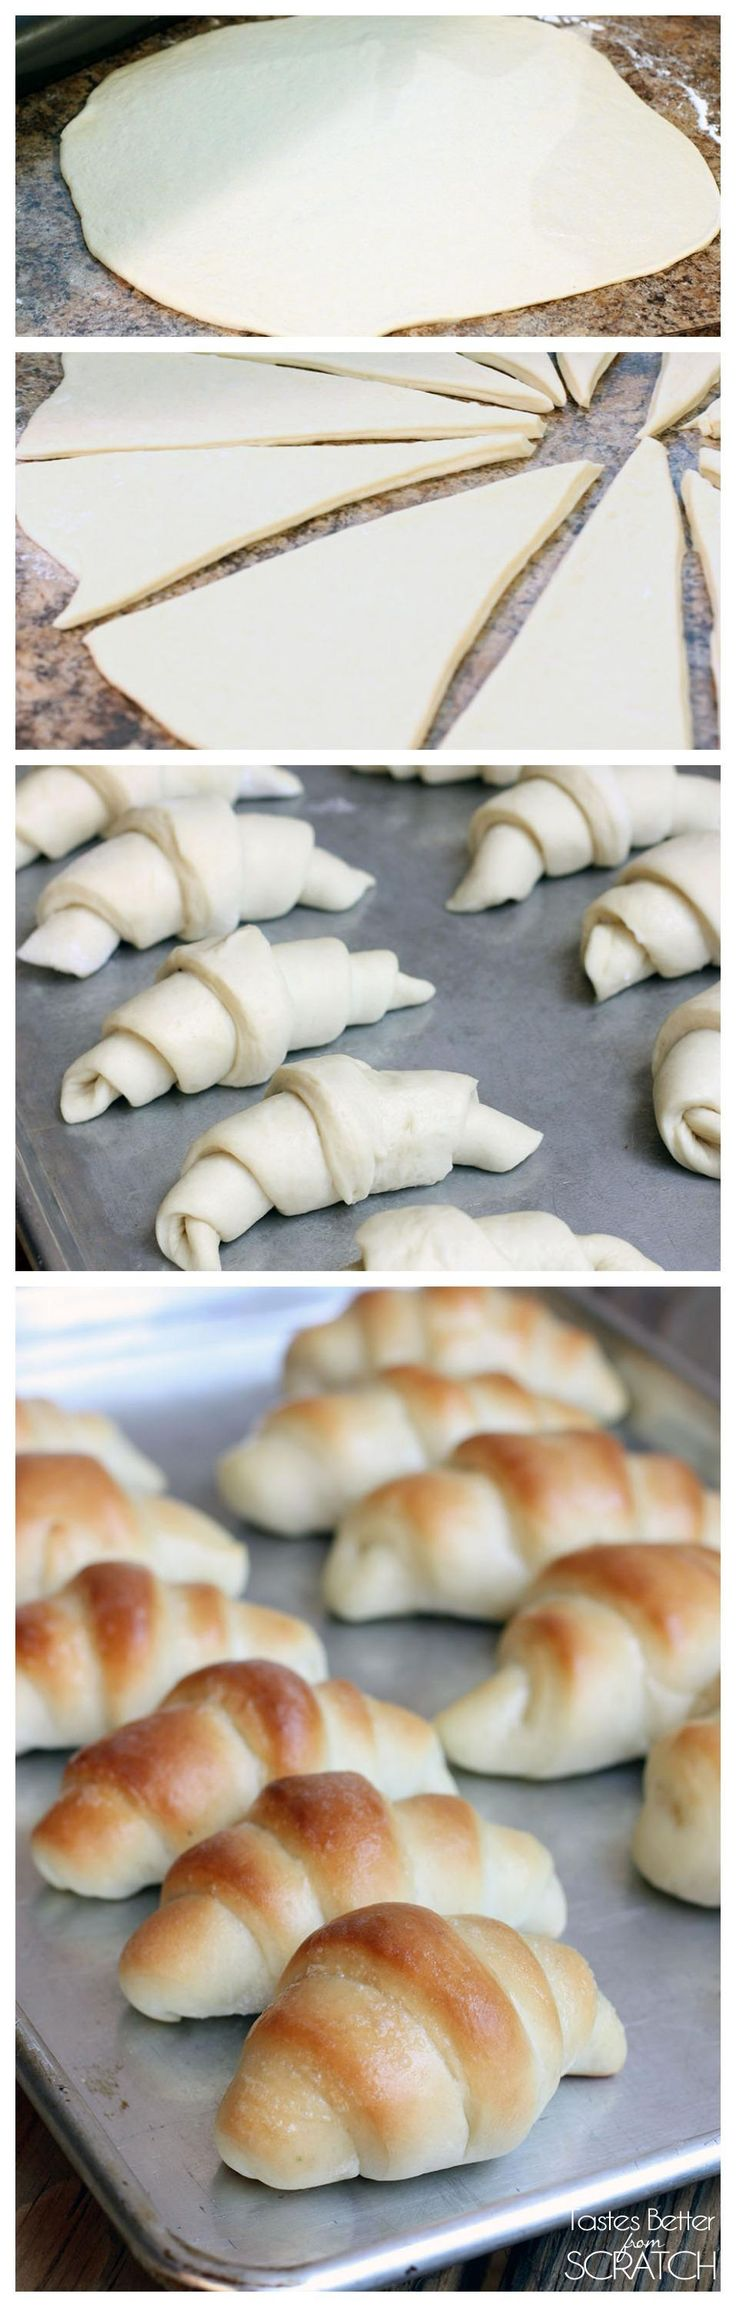 Feather light rolls recipe from TastesBetterFromScratch.com - the BEST light and fluffy homemade rolls!